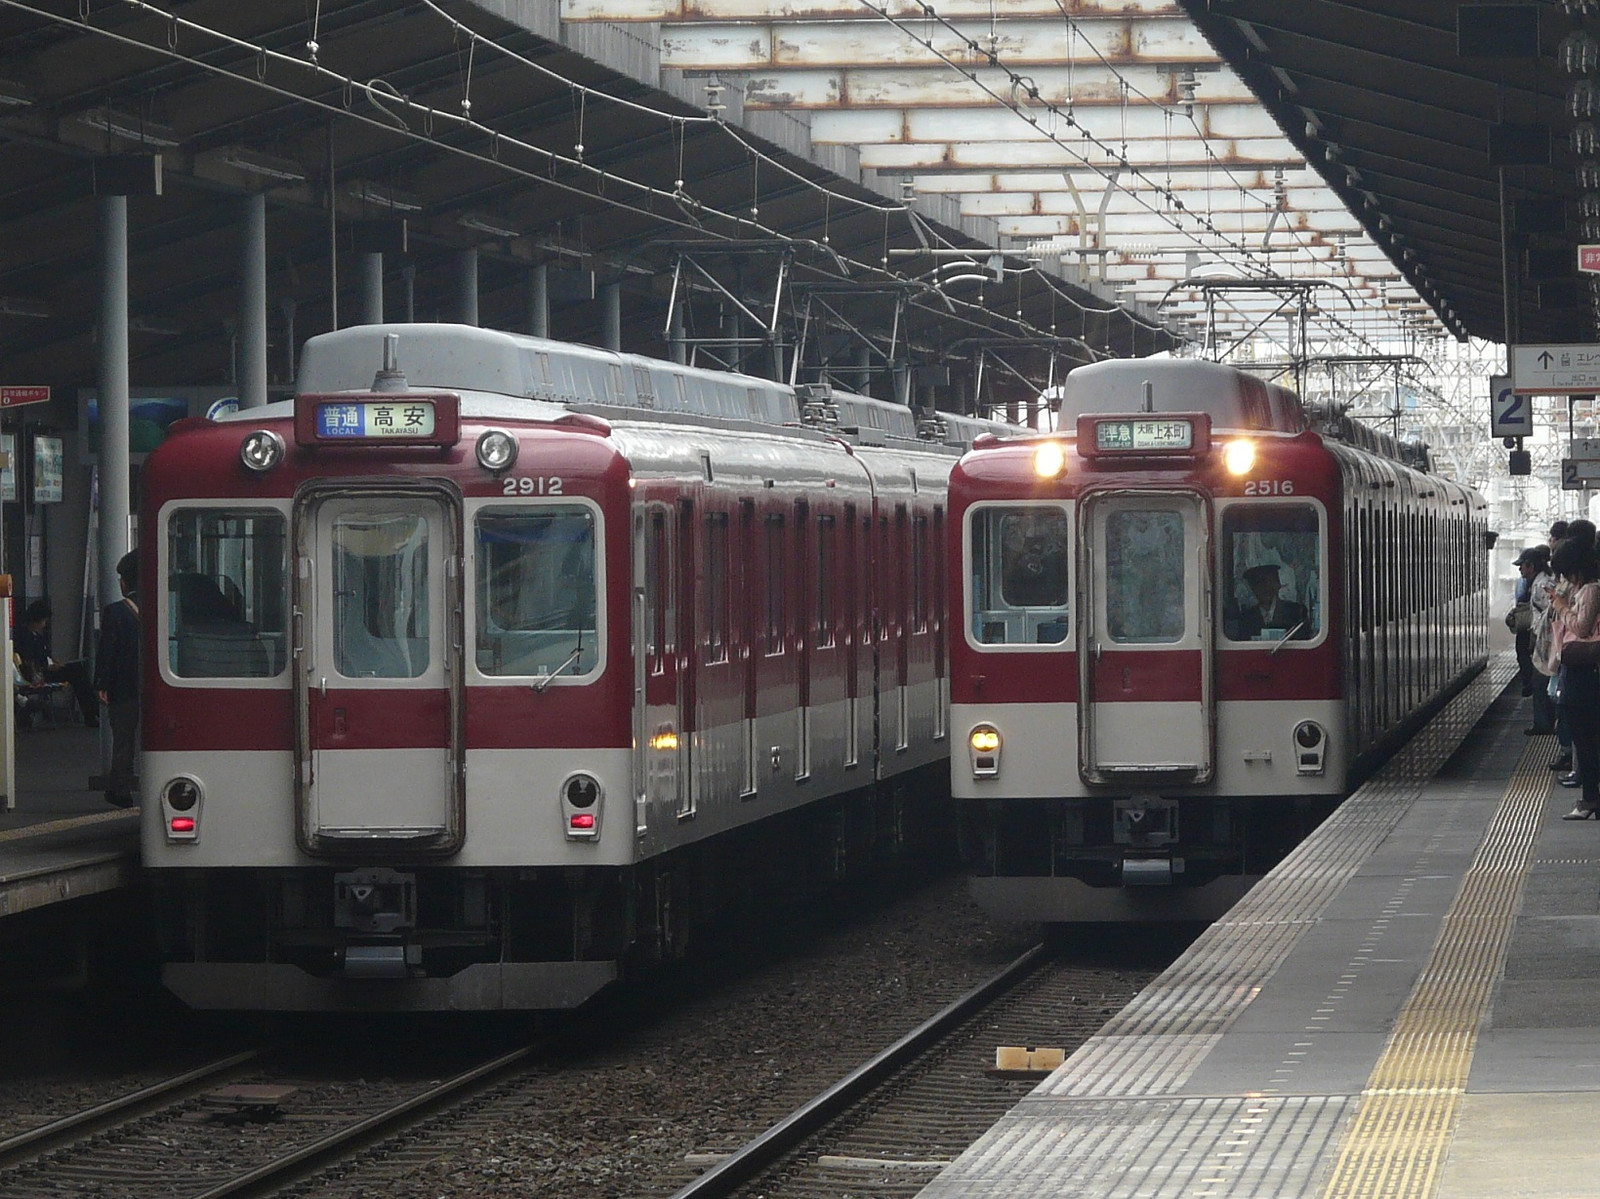 P1230029_2